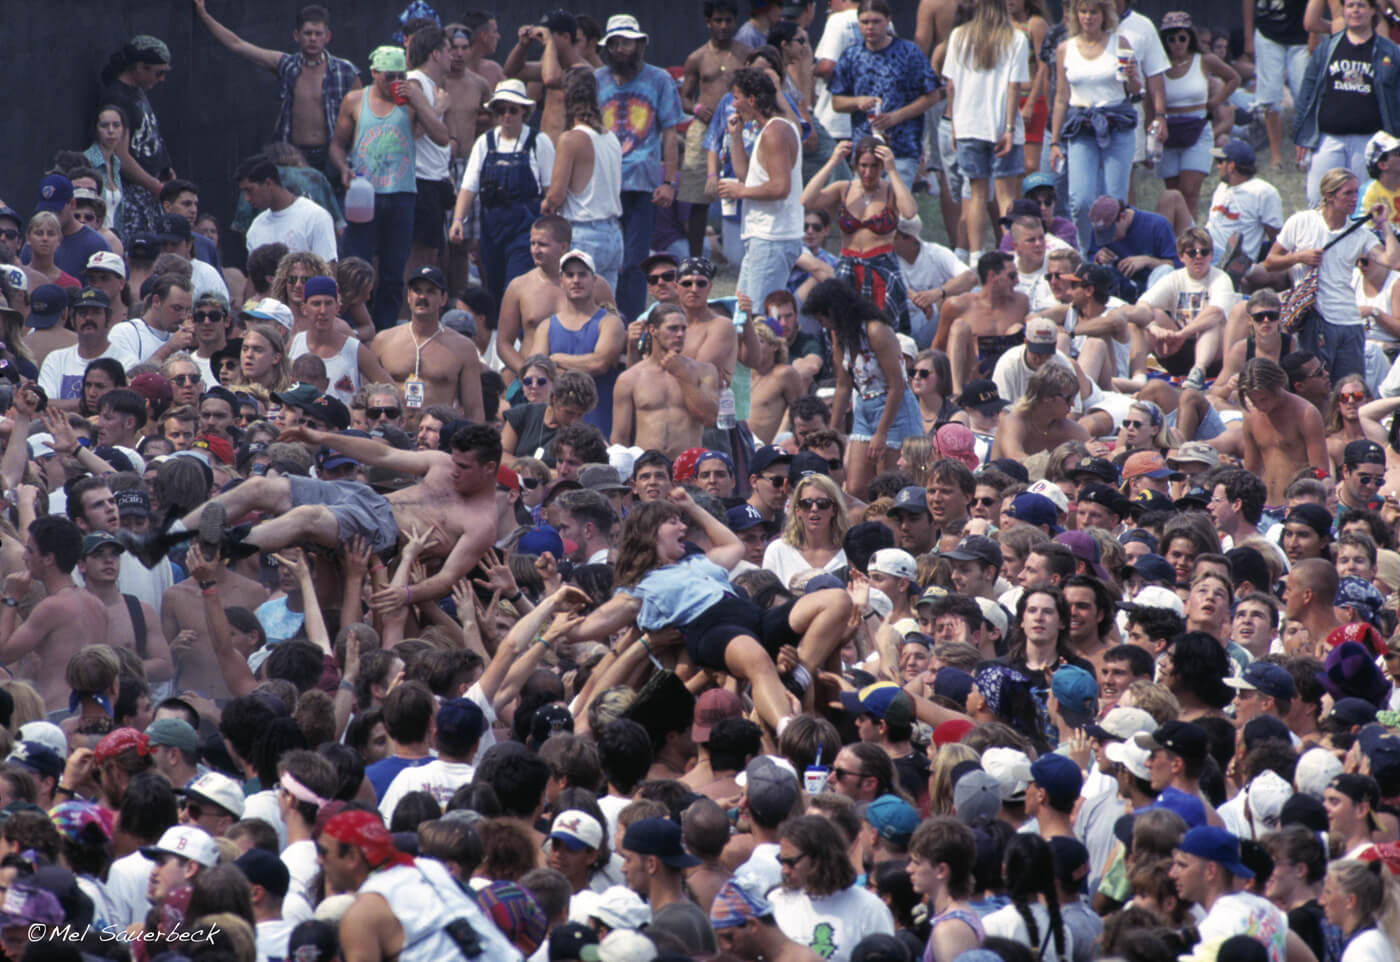 Woodstock crowd surfing